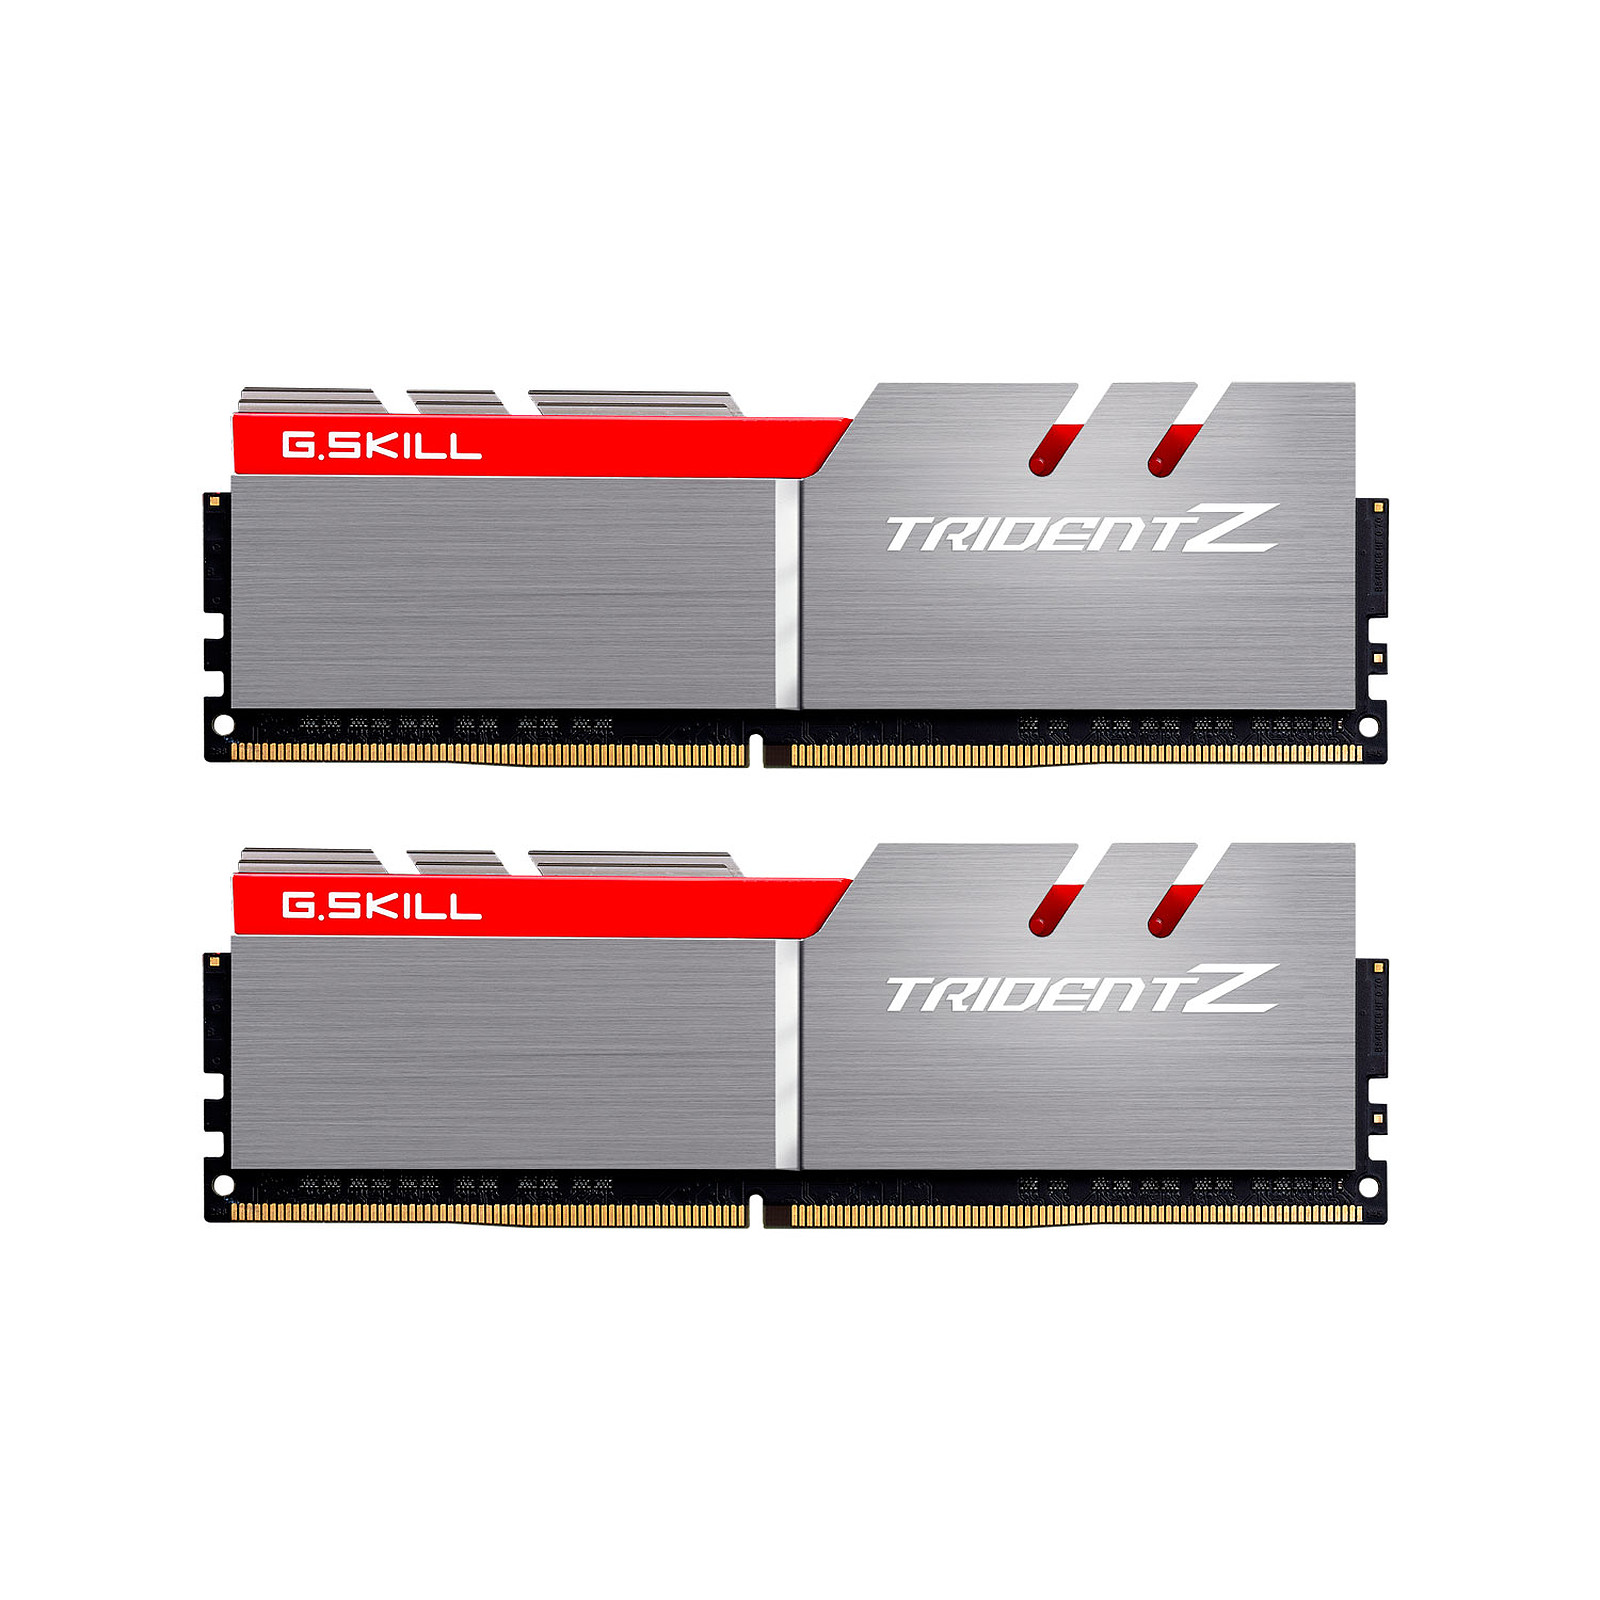 G.Skill Trident Z 8 Go (2x 4 Go) DDR4 4133 MHz CL19